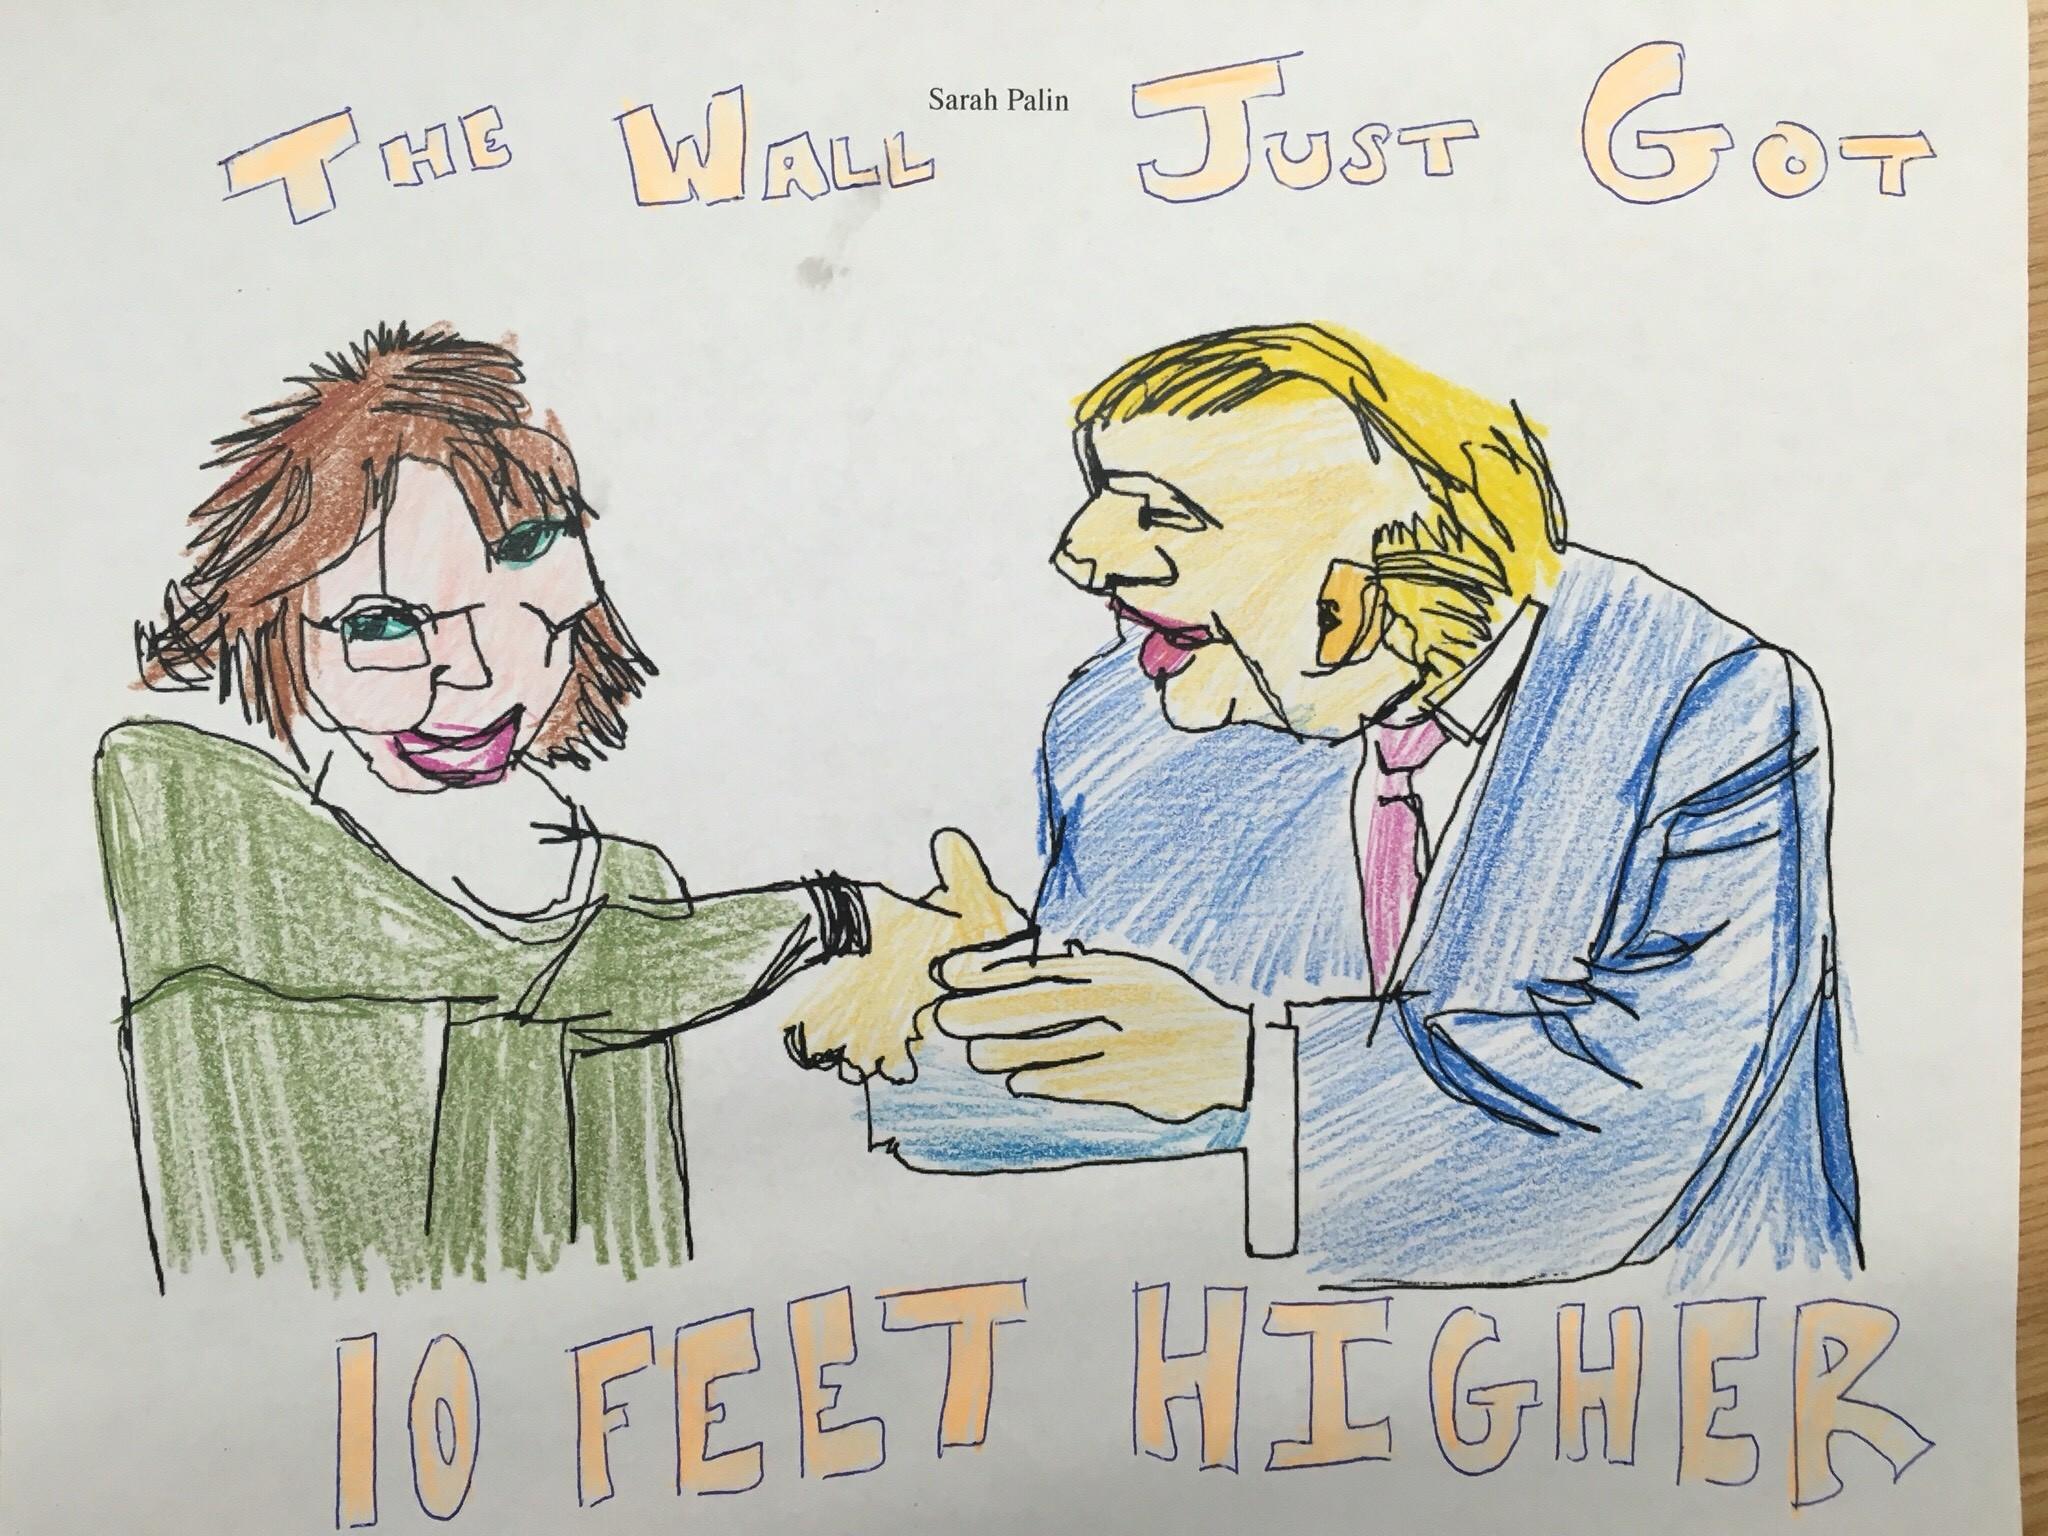 Oakland Designer S Ugly Donald Trump Coloring Book Raises